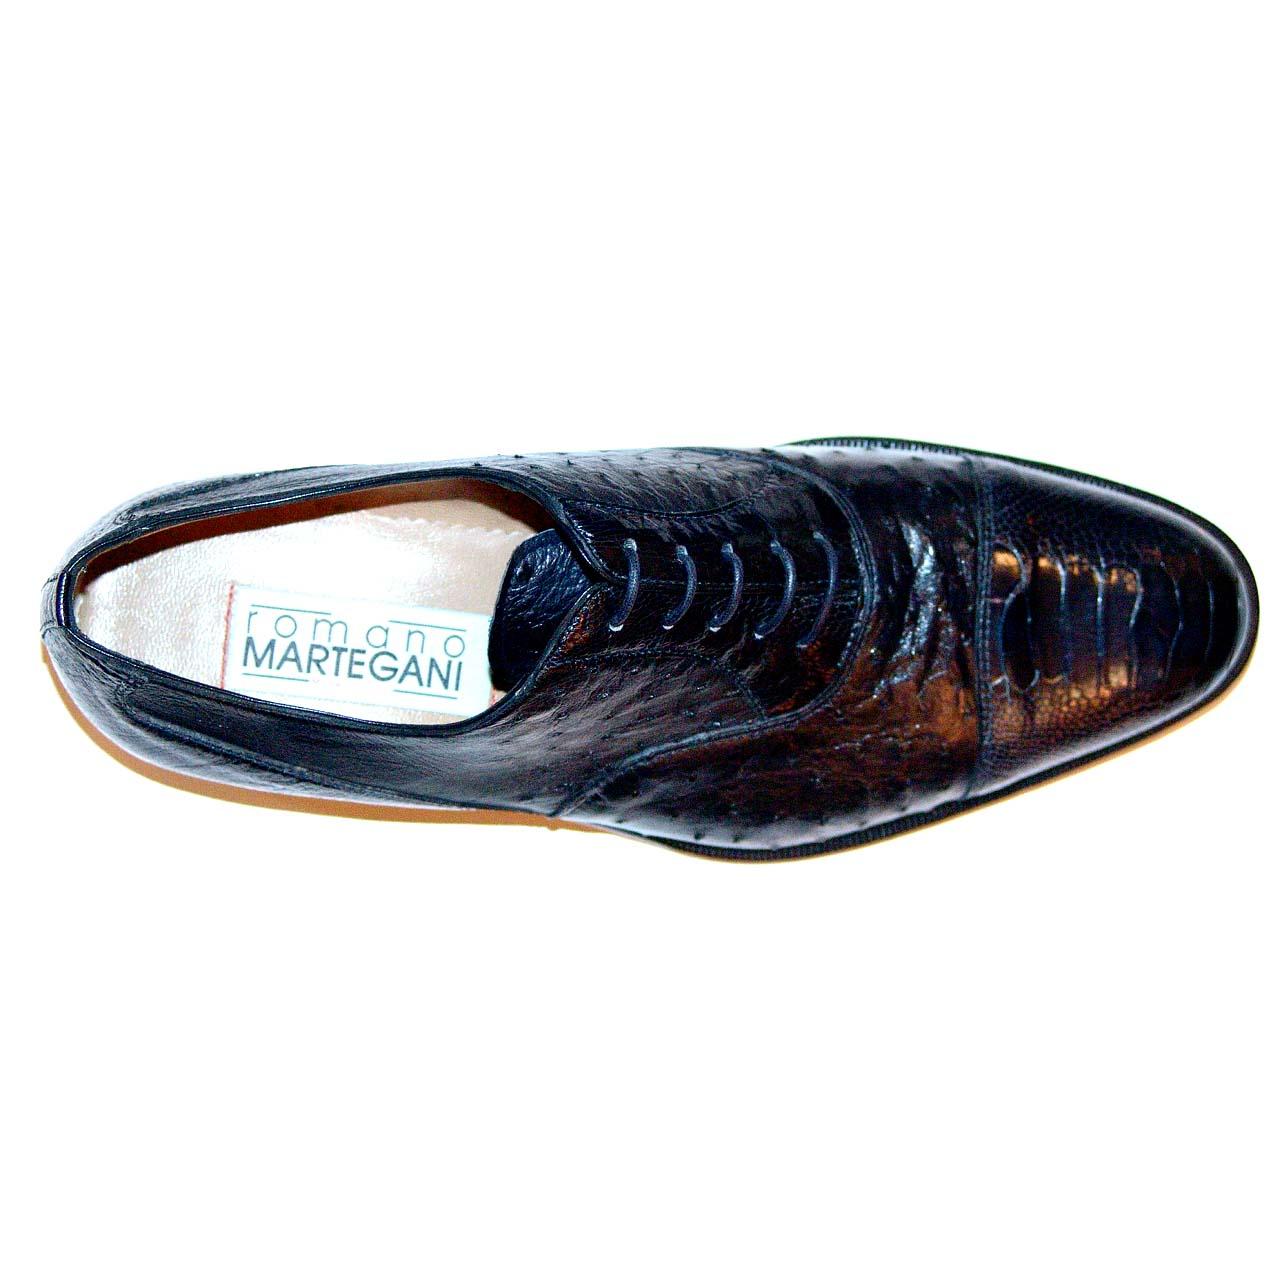 Romano Martegani 4621 Ostrich Cap Toe Black